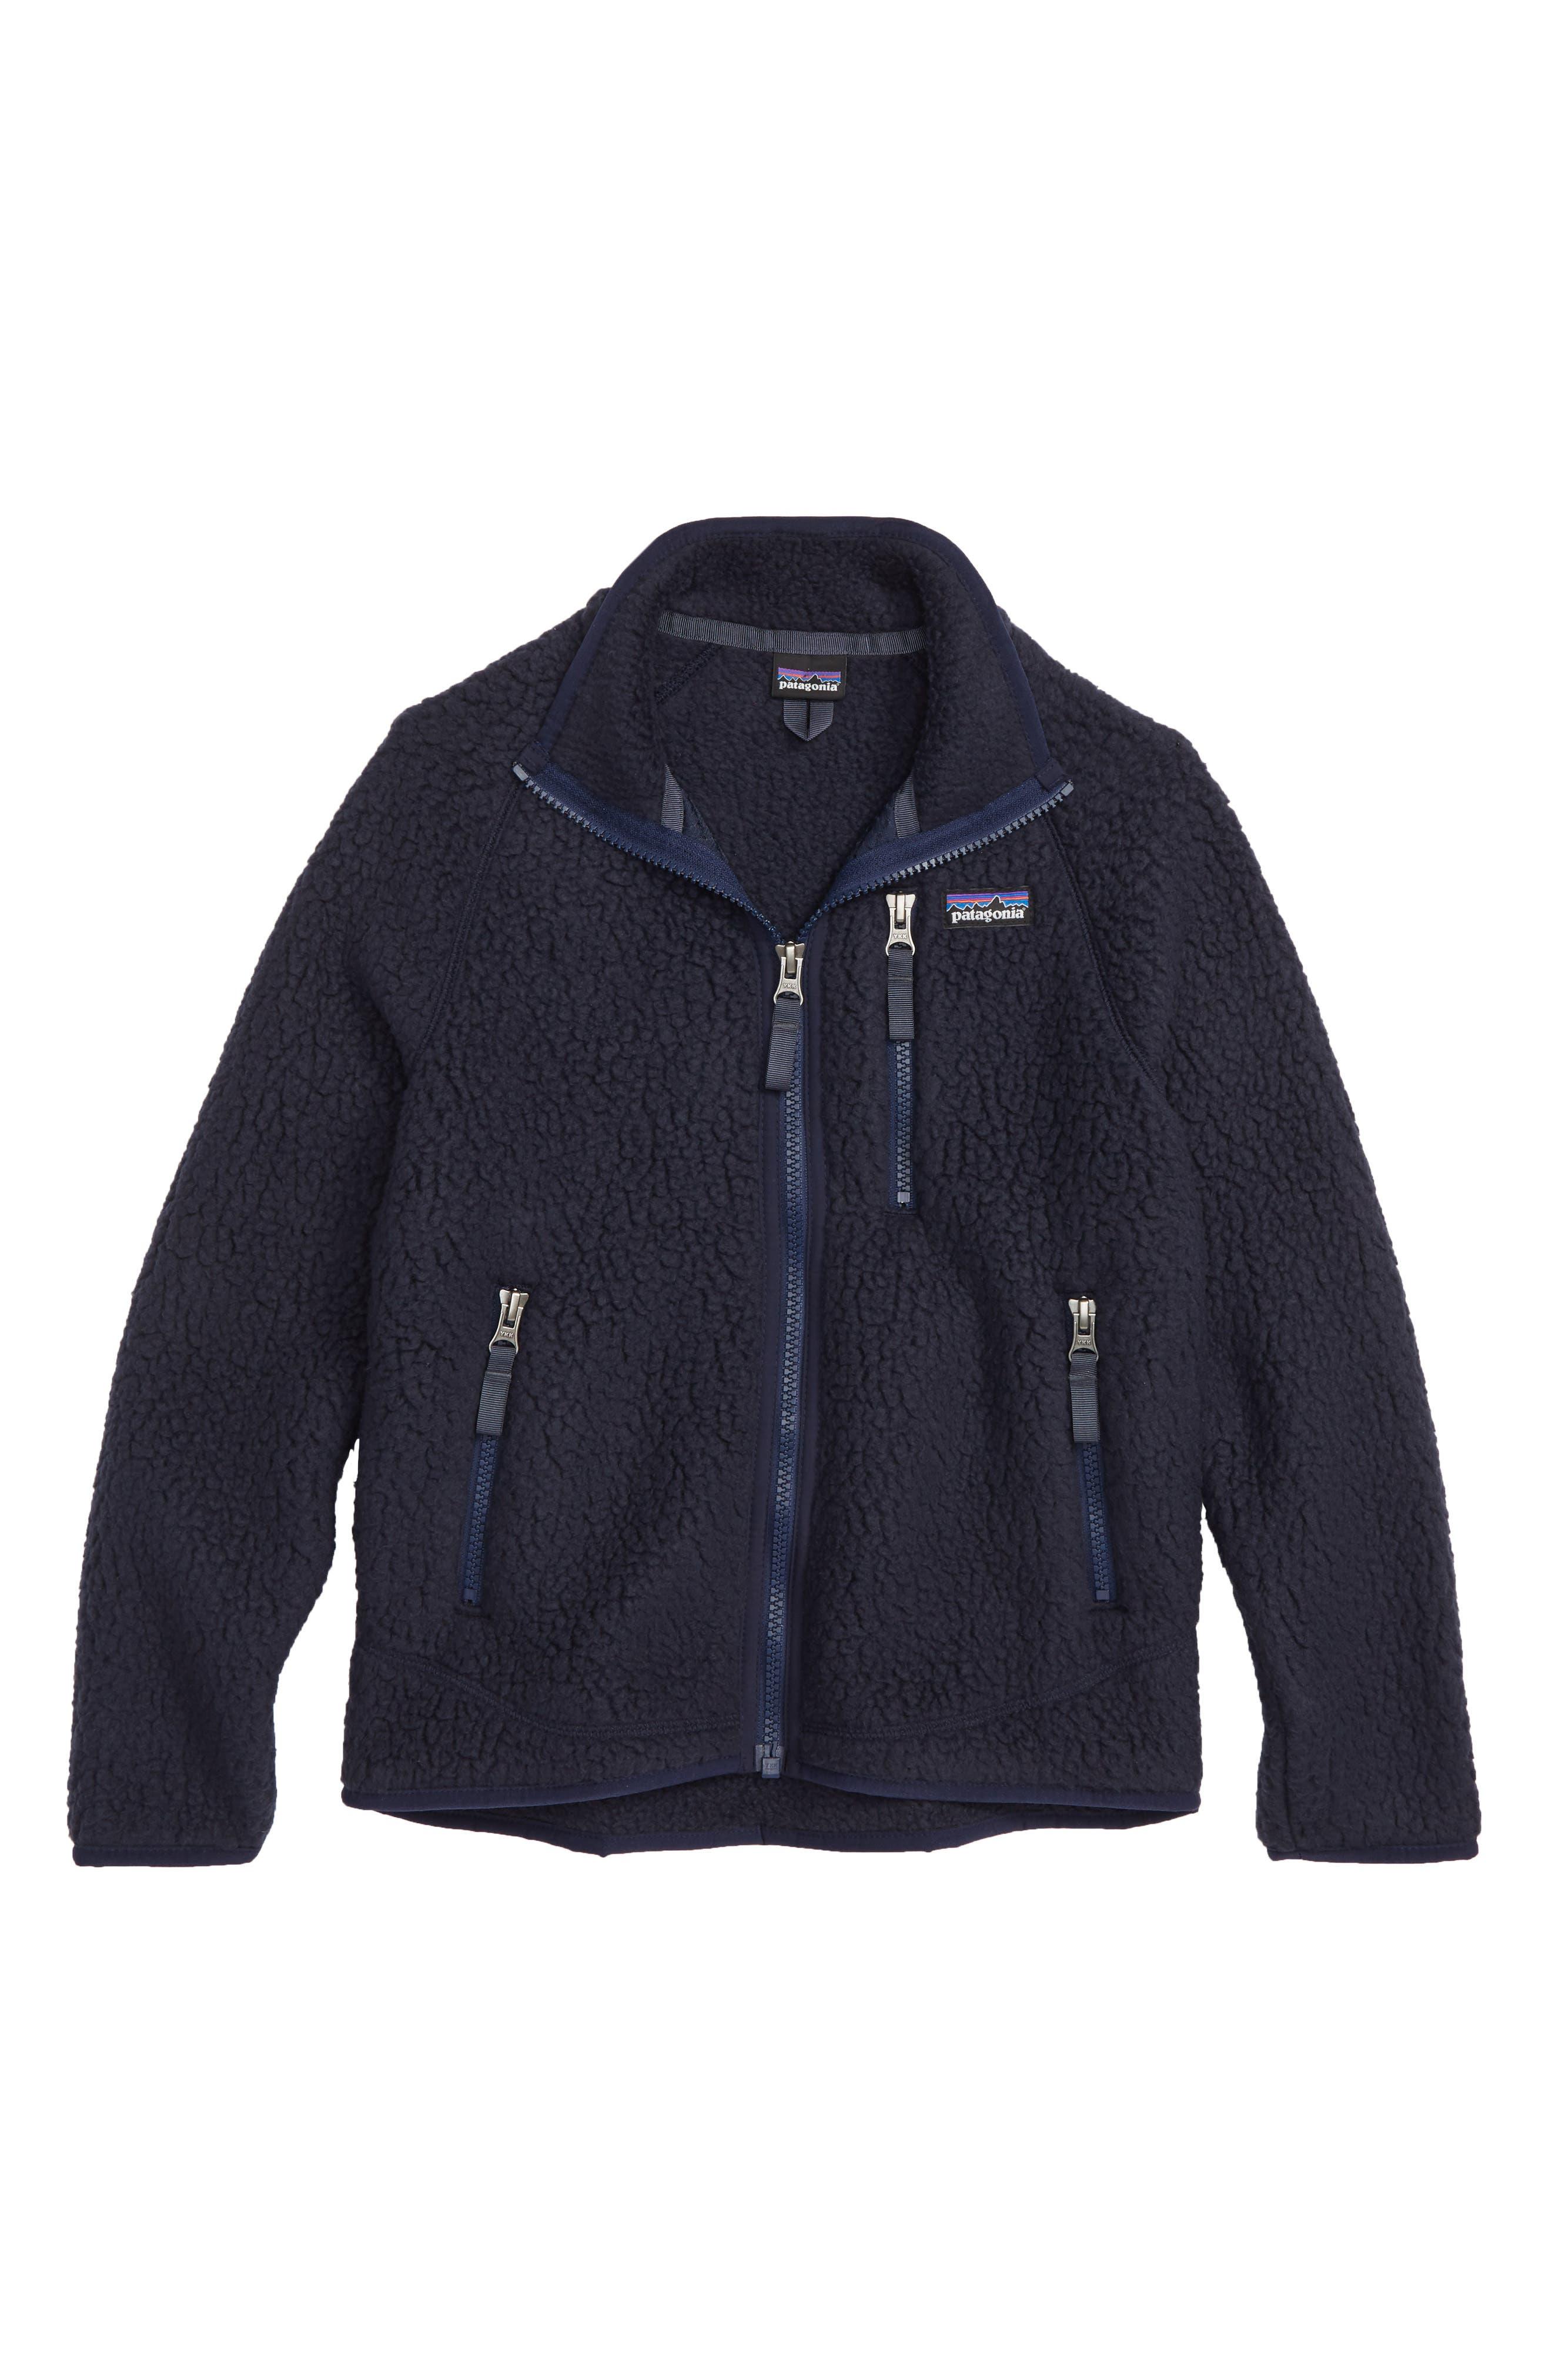 Retro Pile Faux Shearling Jacket,                         Main,                         color, NAVY